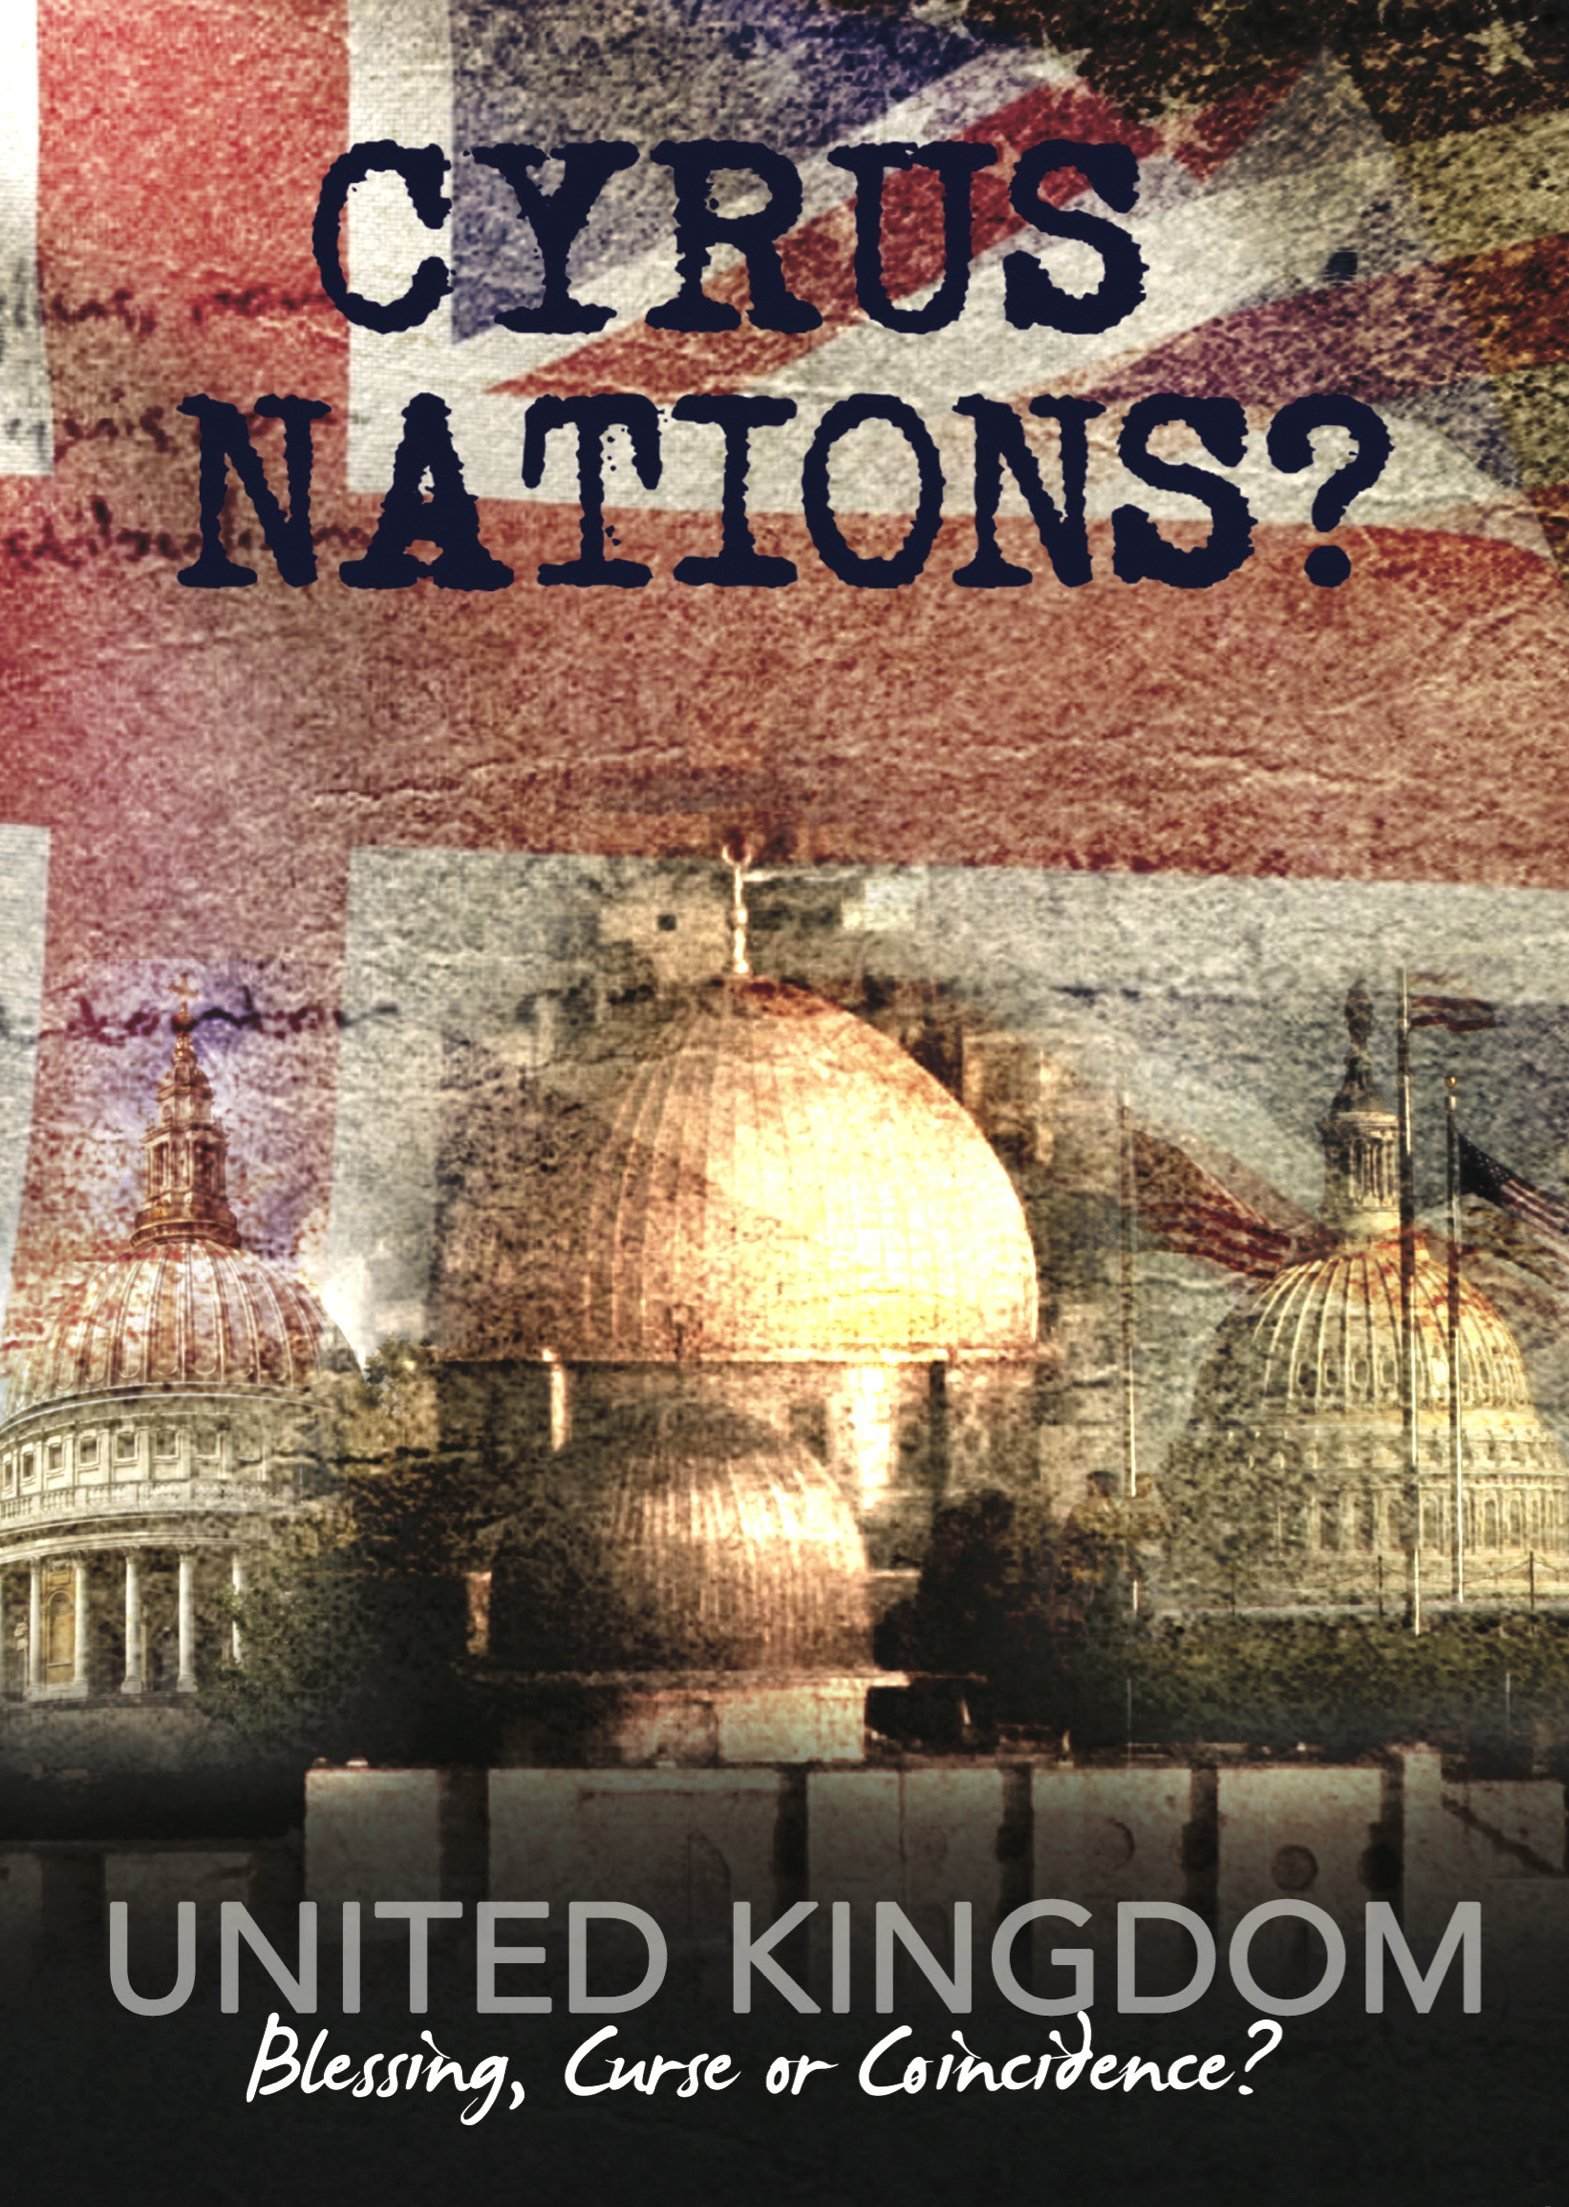 Cyrus Nations? UK